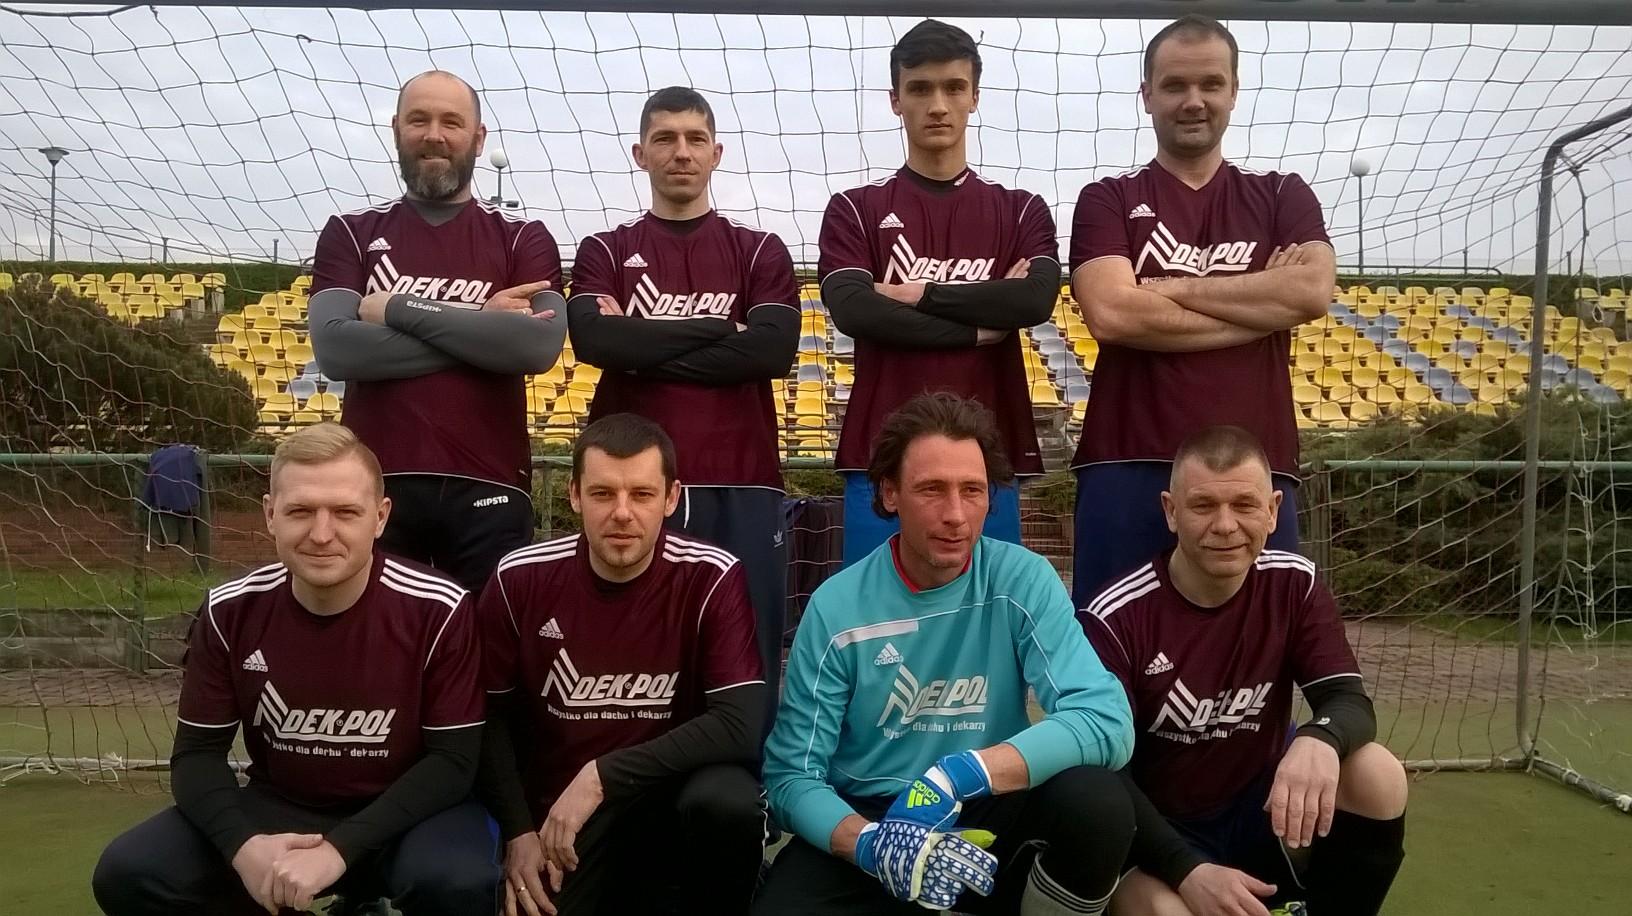 DEK-POL drużyna piłkarska